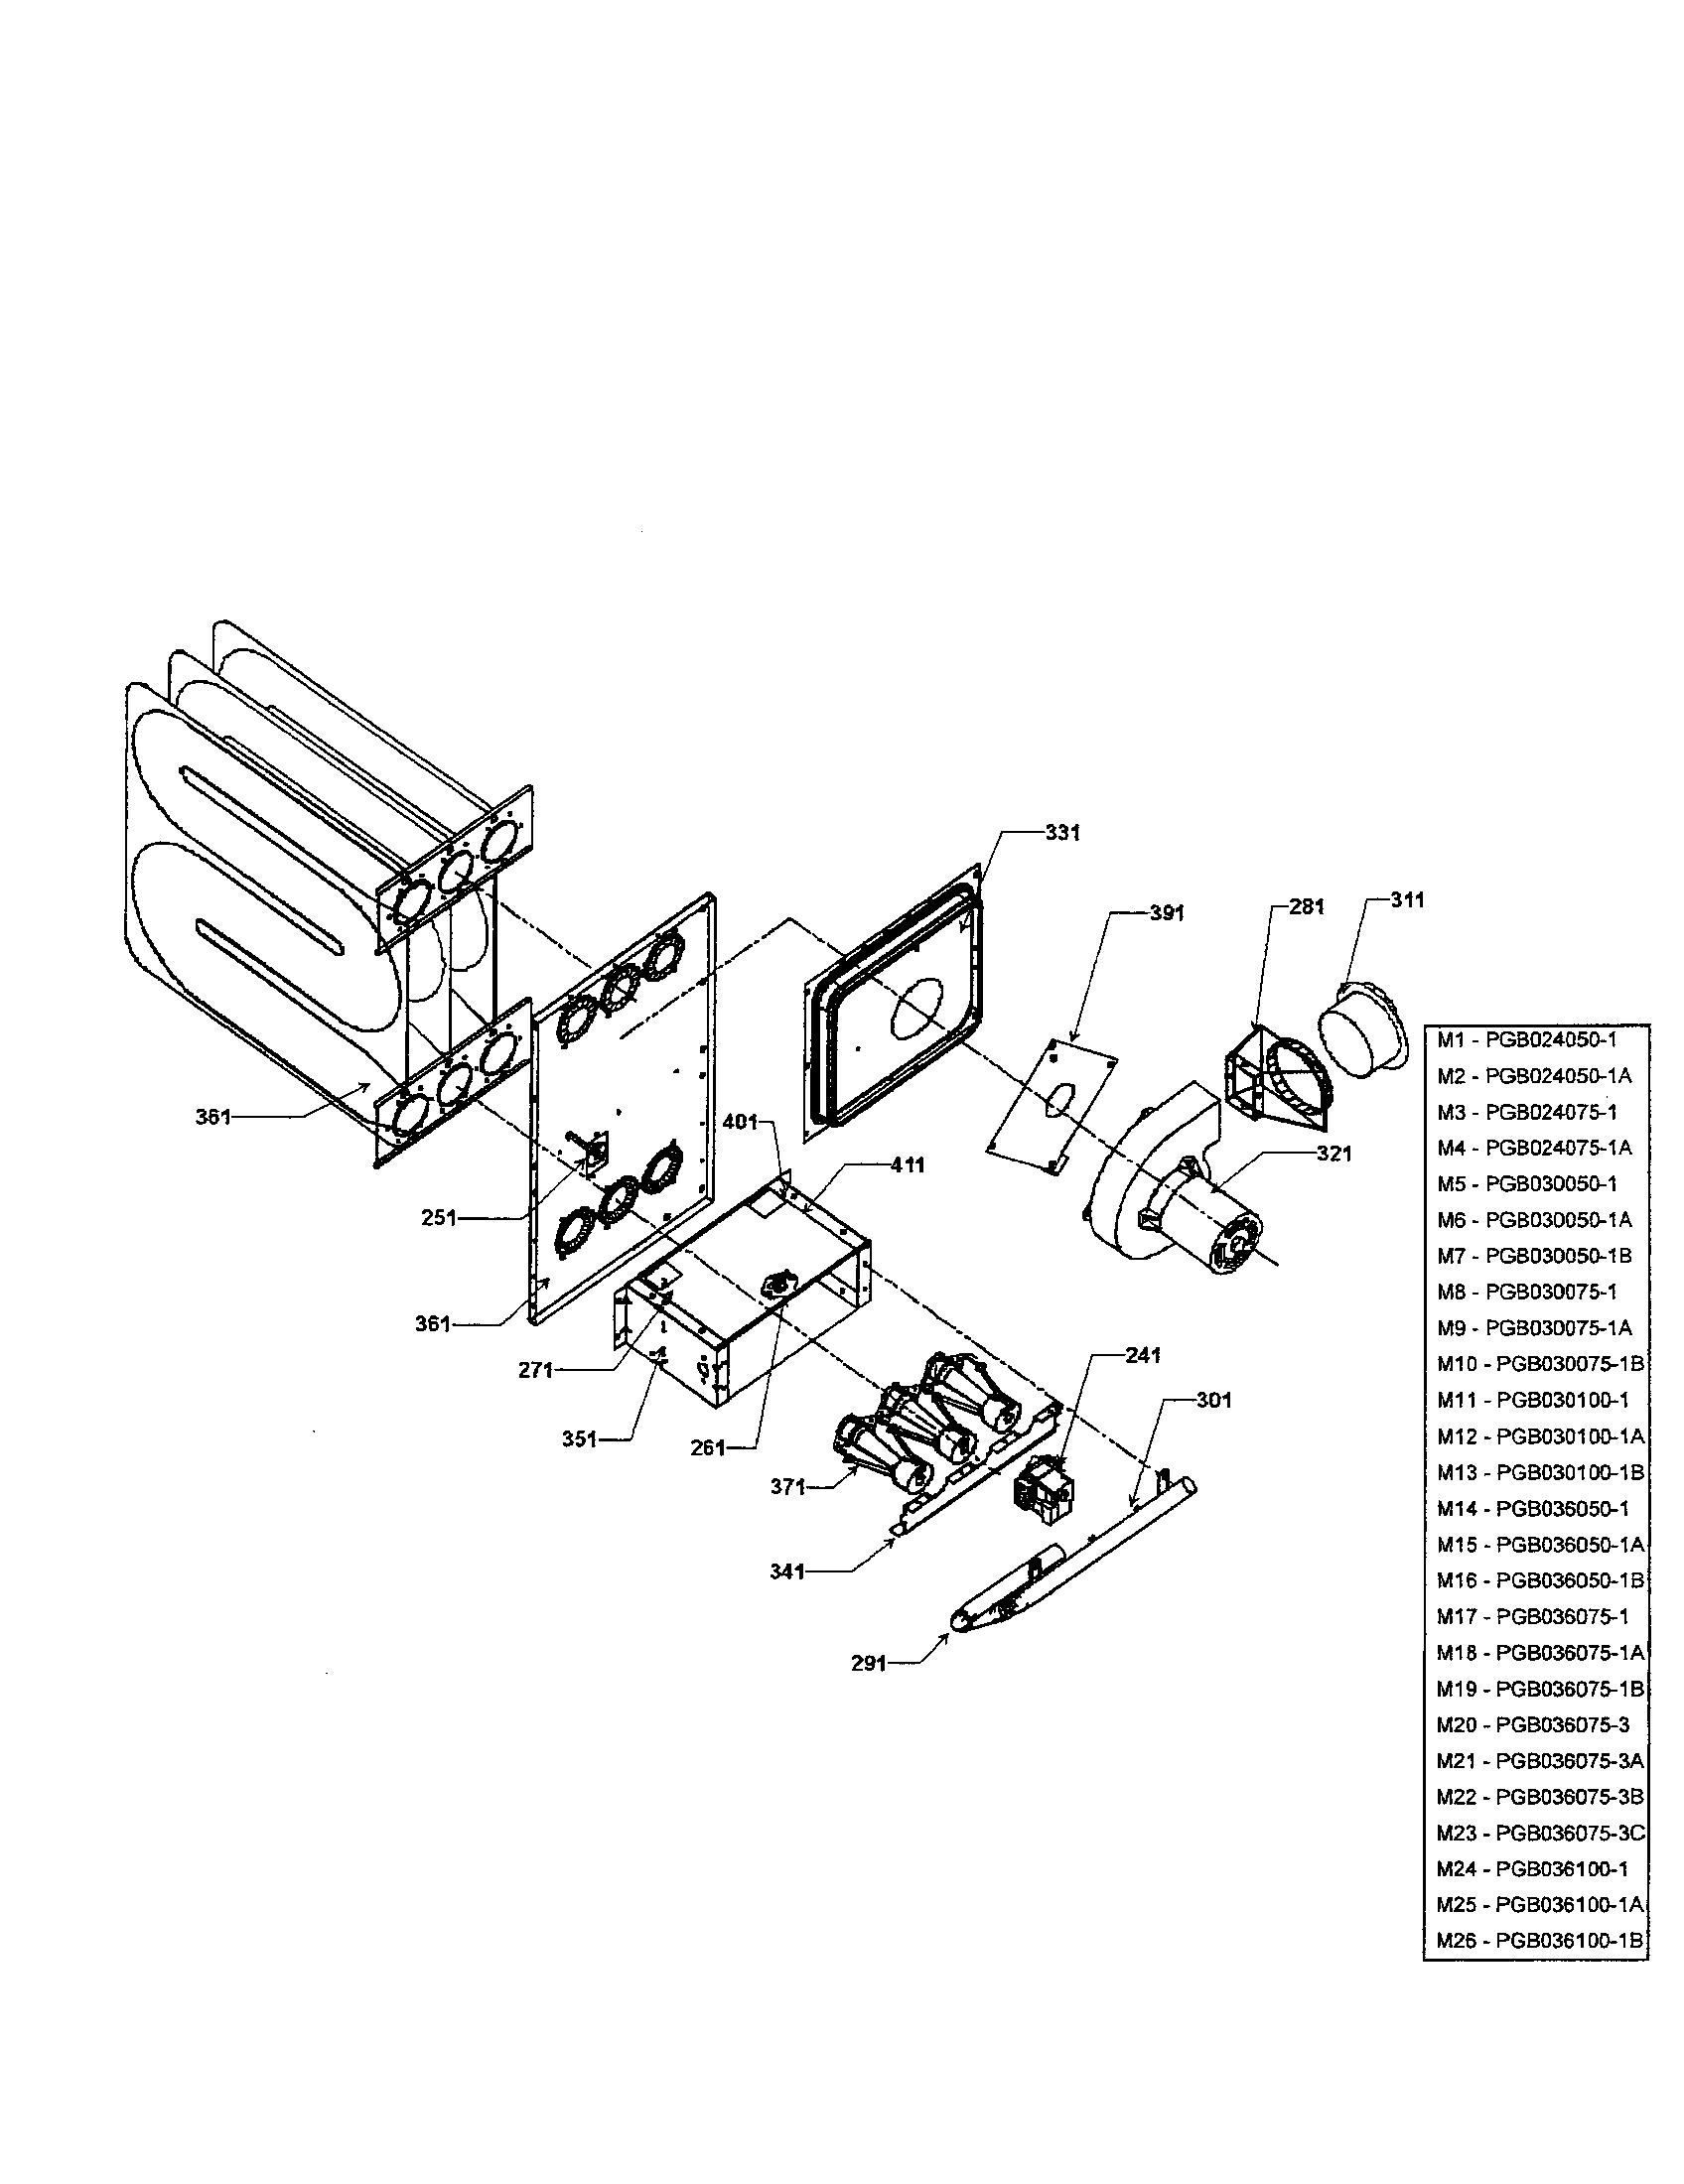 Goodman model PGB036100-1 package units(both units